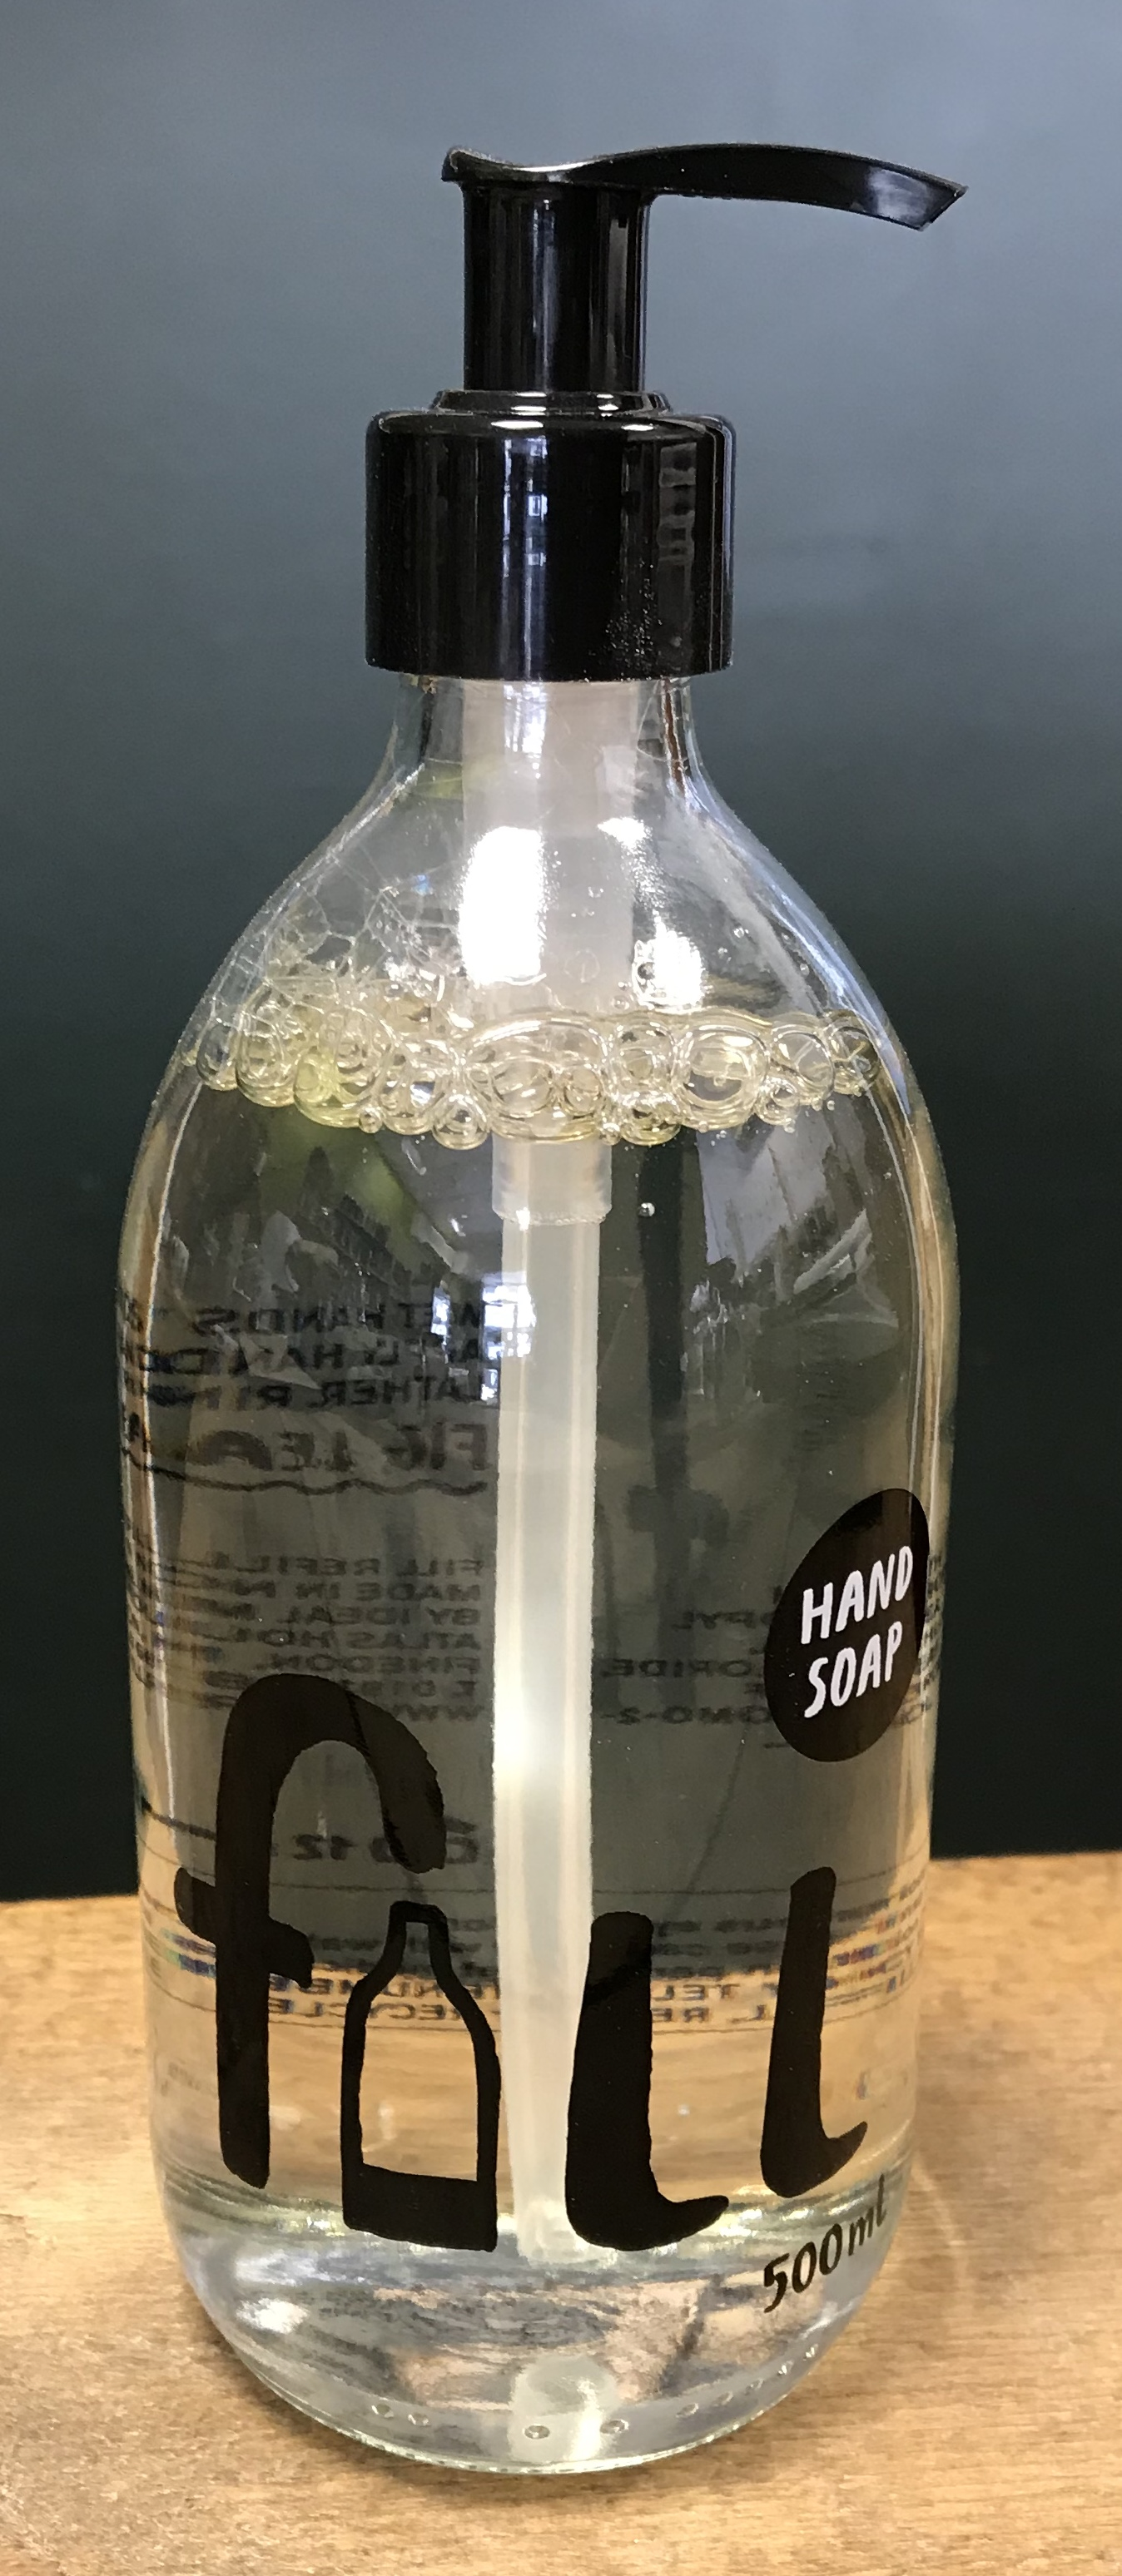 Hand Soap 500ml Bottle